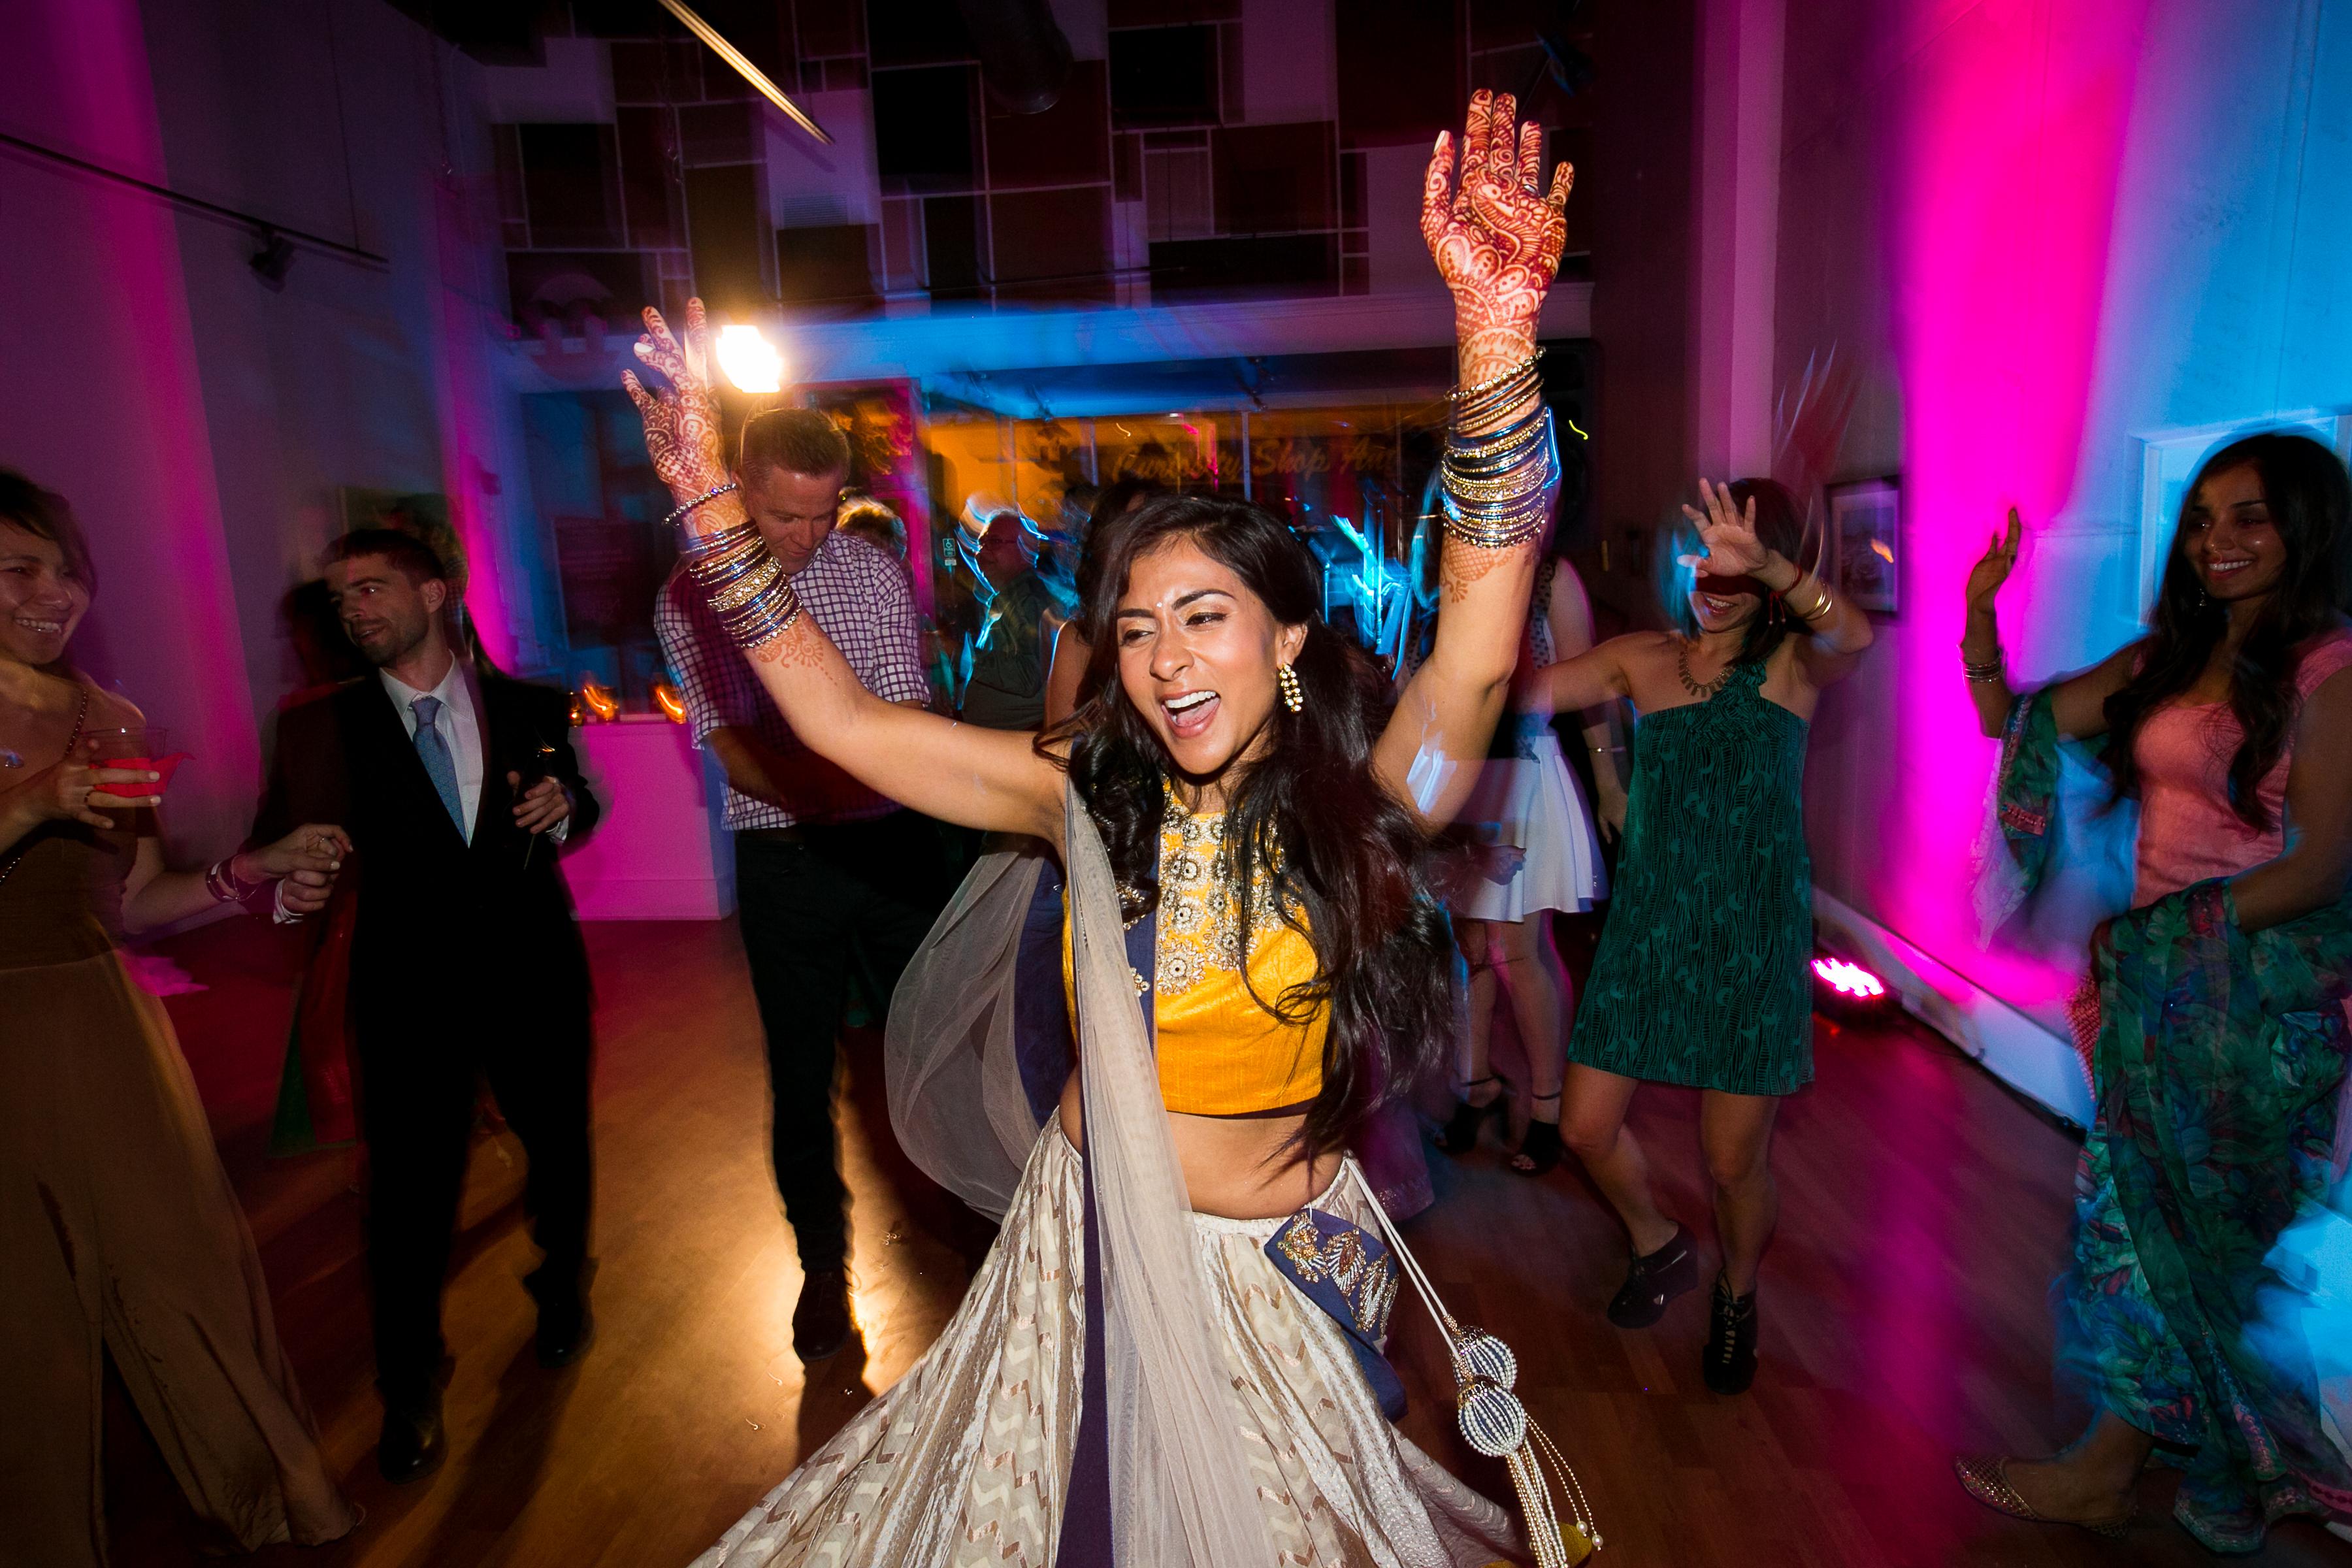 Reception Ceremony In Hindi: Happy 1 Year Anniversary Anita And Rohan! Bakersfield